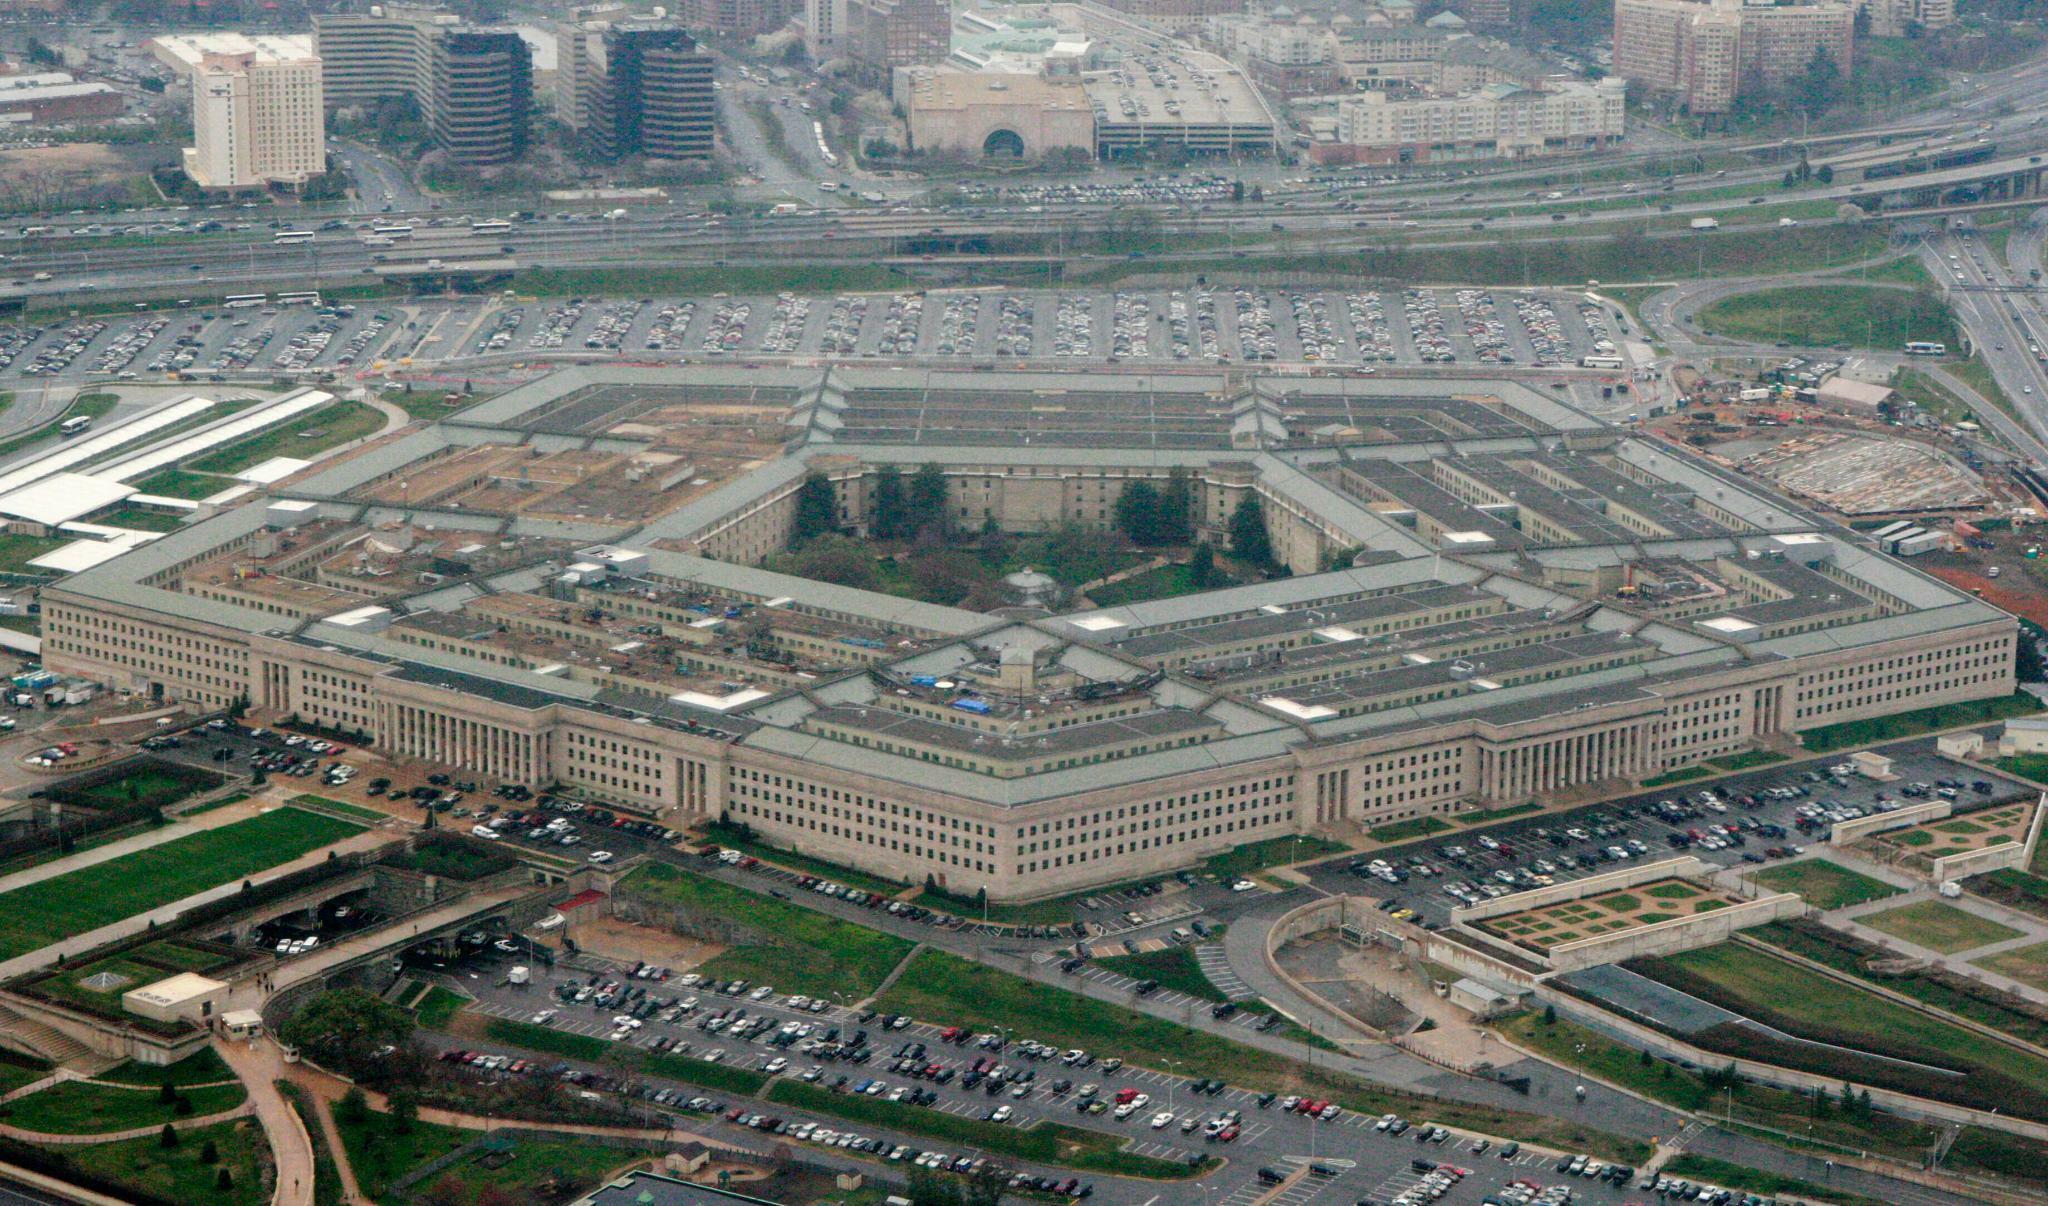 Amazon klagt gegen Auftragsvergabe des Pentagon an Microsoft